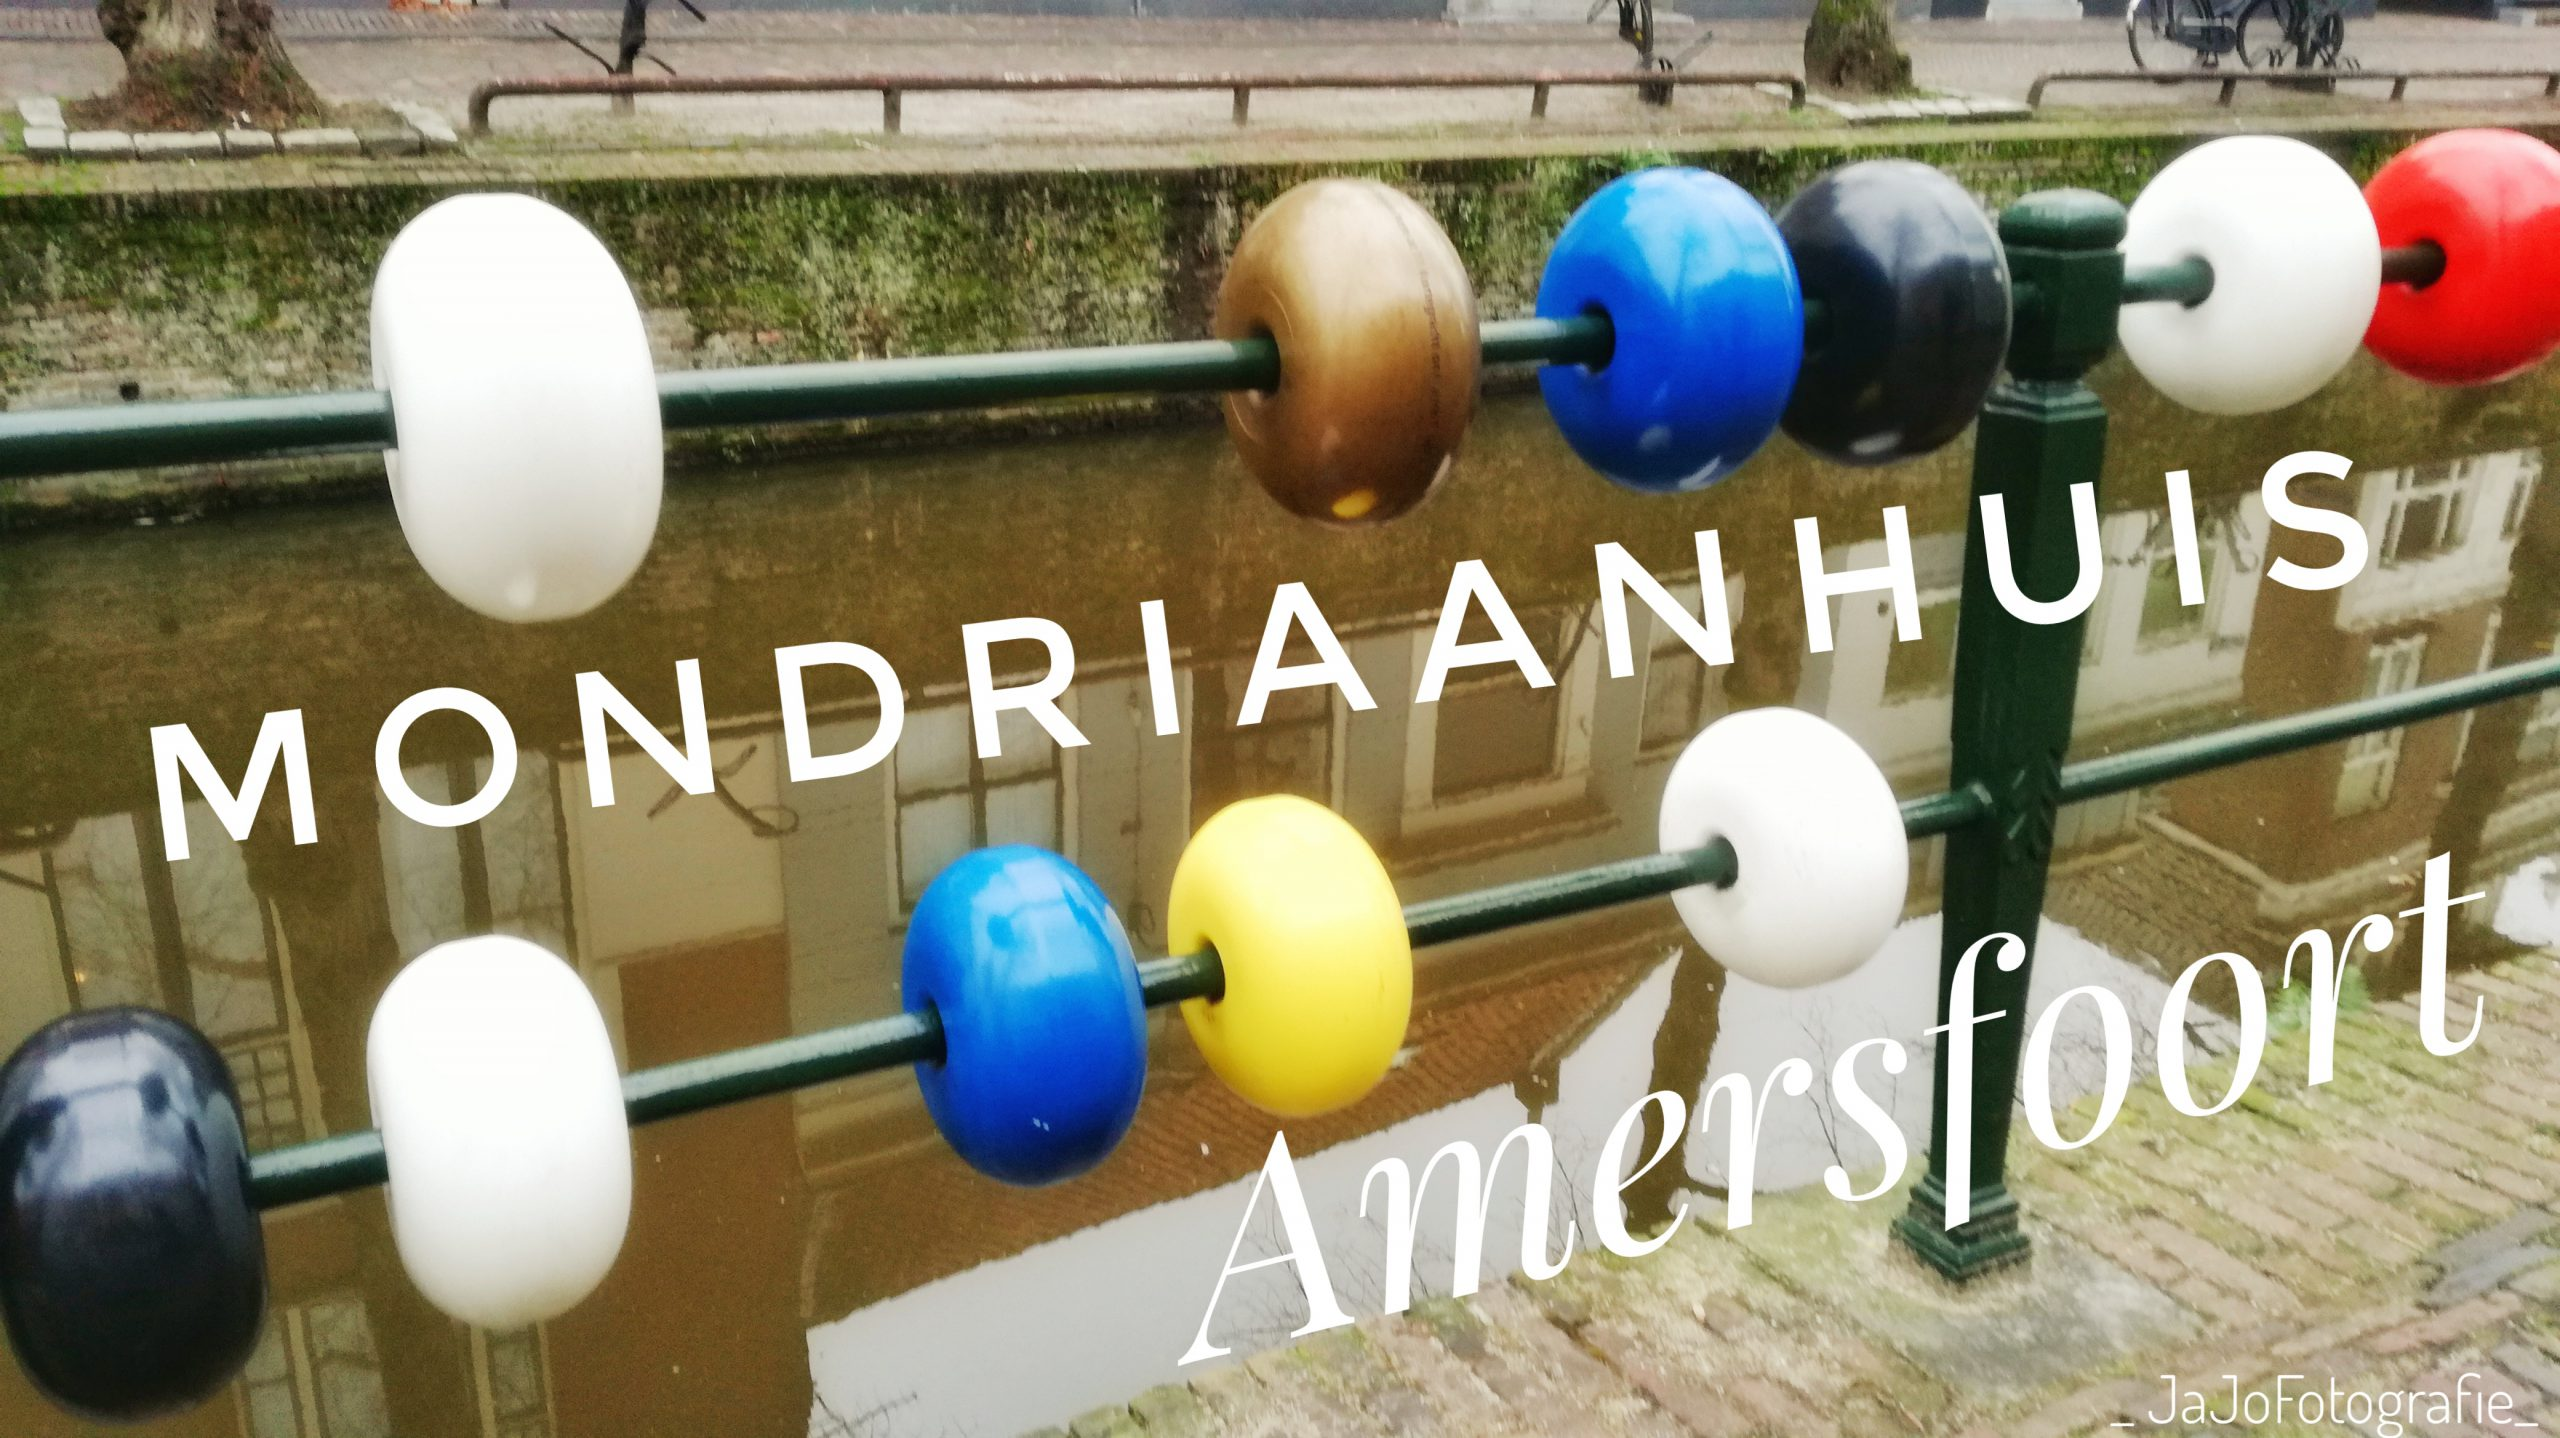 Mondriaanhuis – Amersfoort